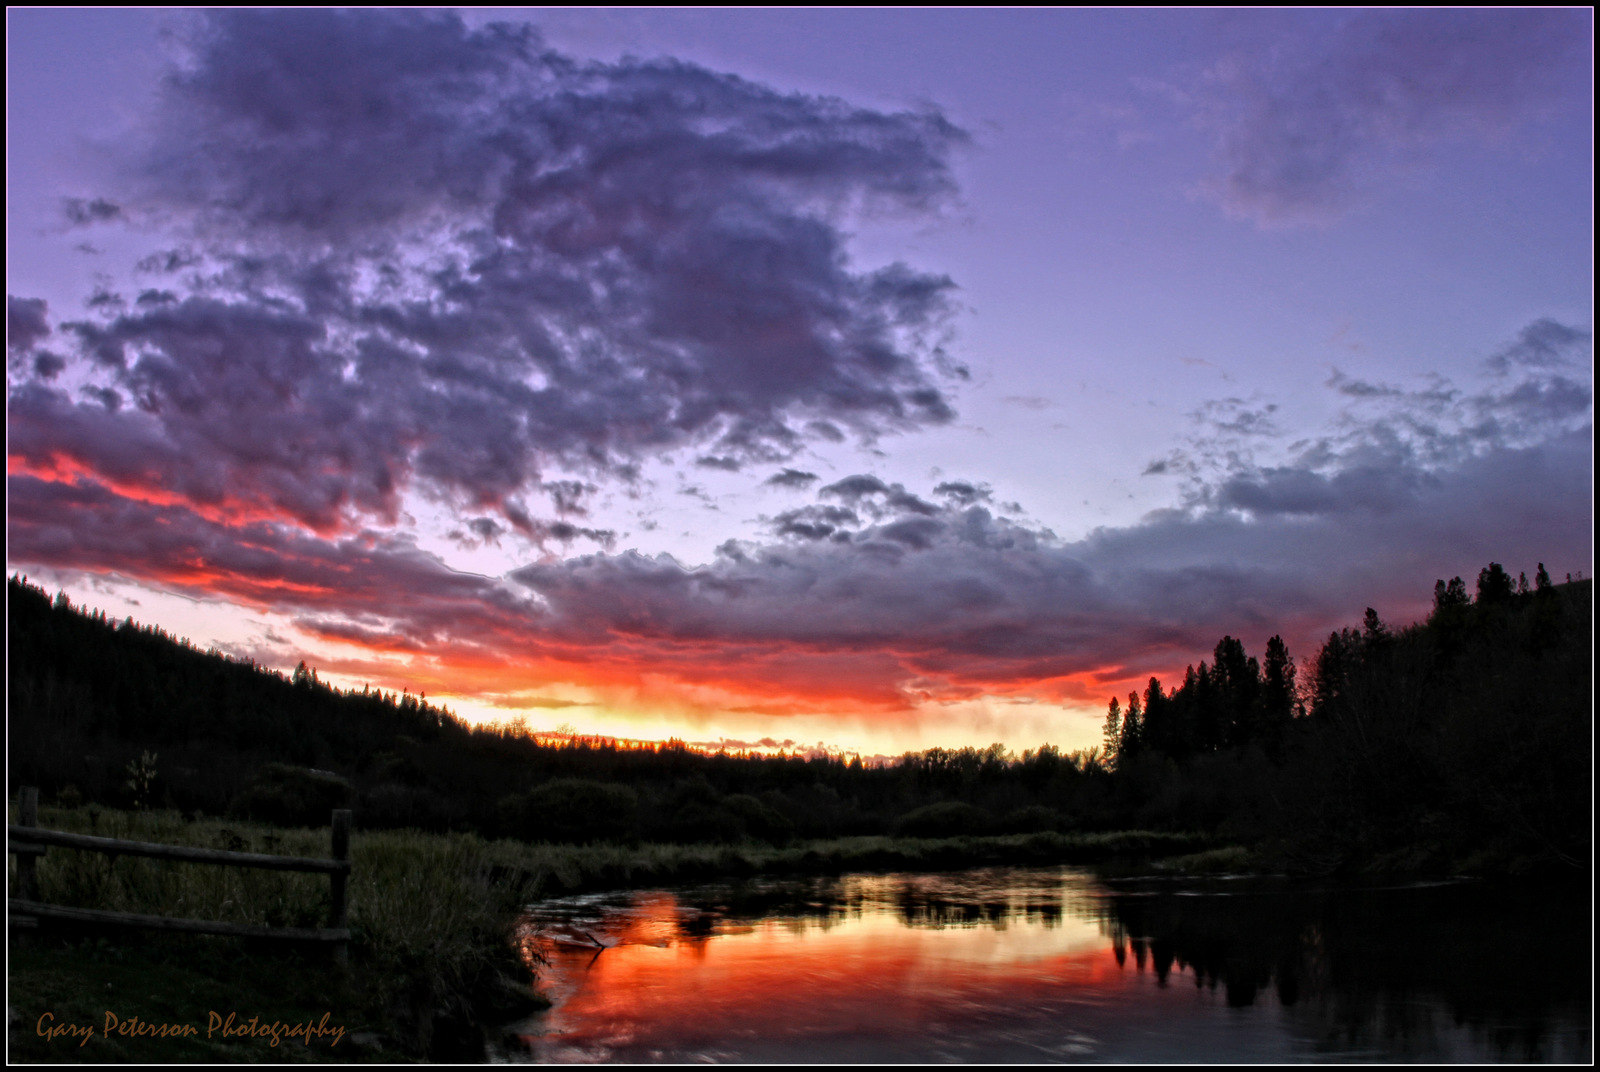 021-19-1-Sunset  1.jpg